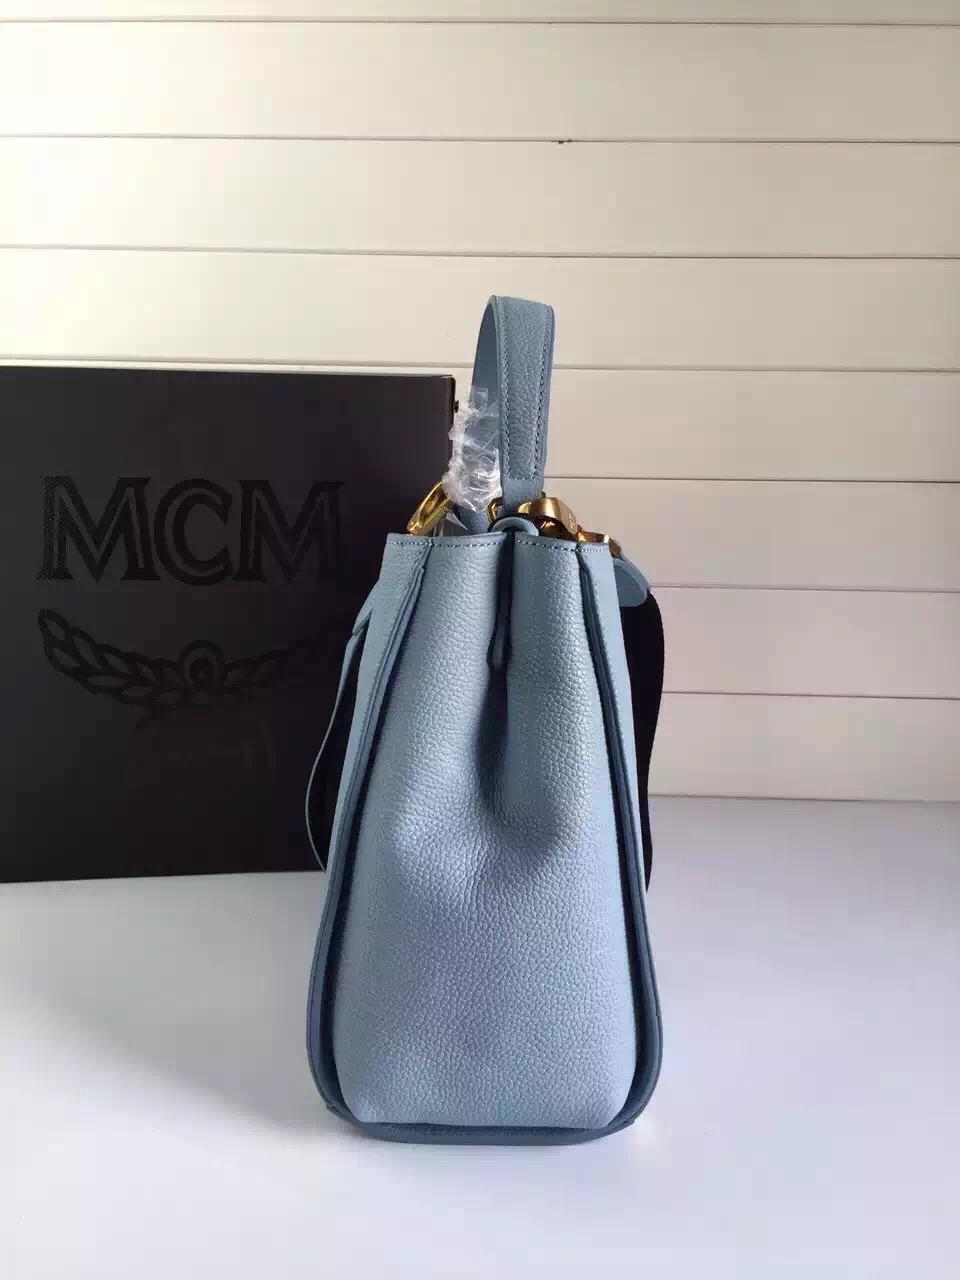 MCM韩国进口牛皮 浅蓝原单 旗舰店特供 里布纯棉质地